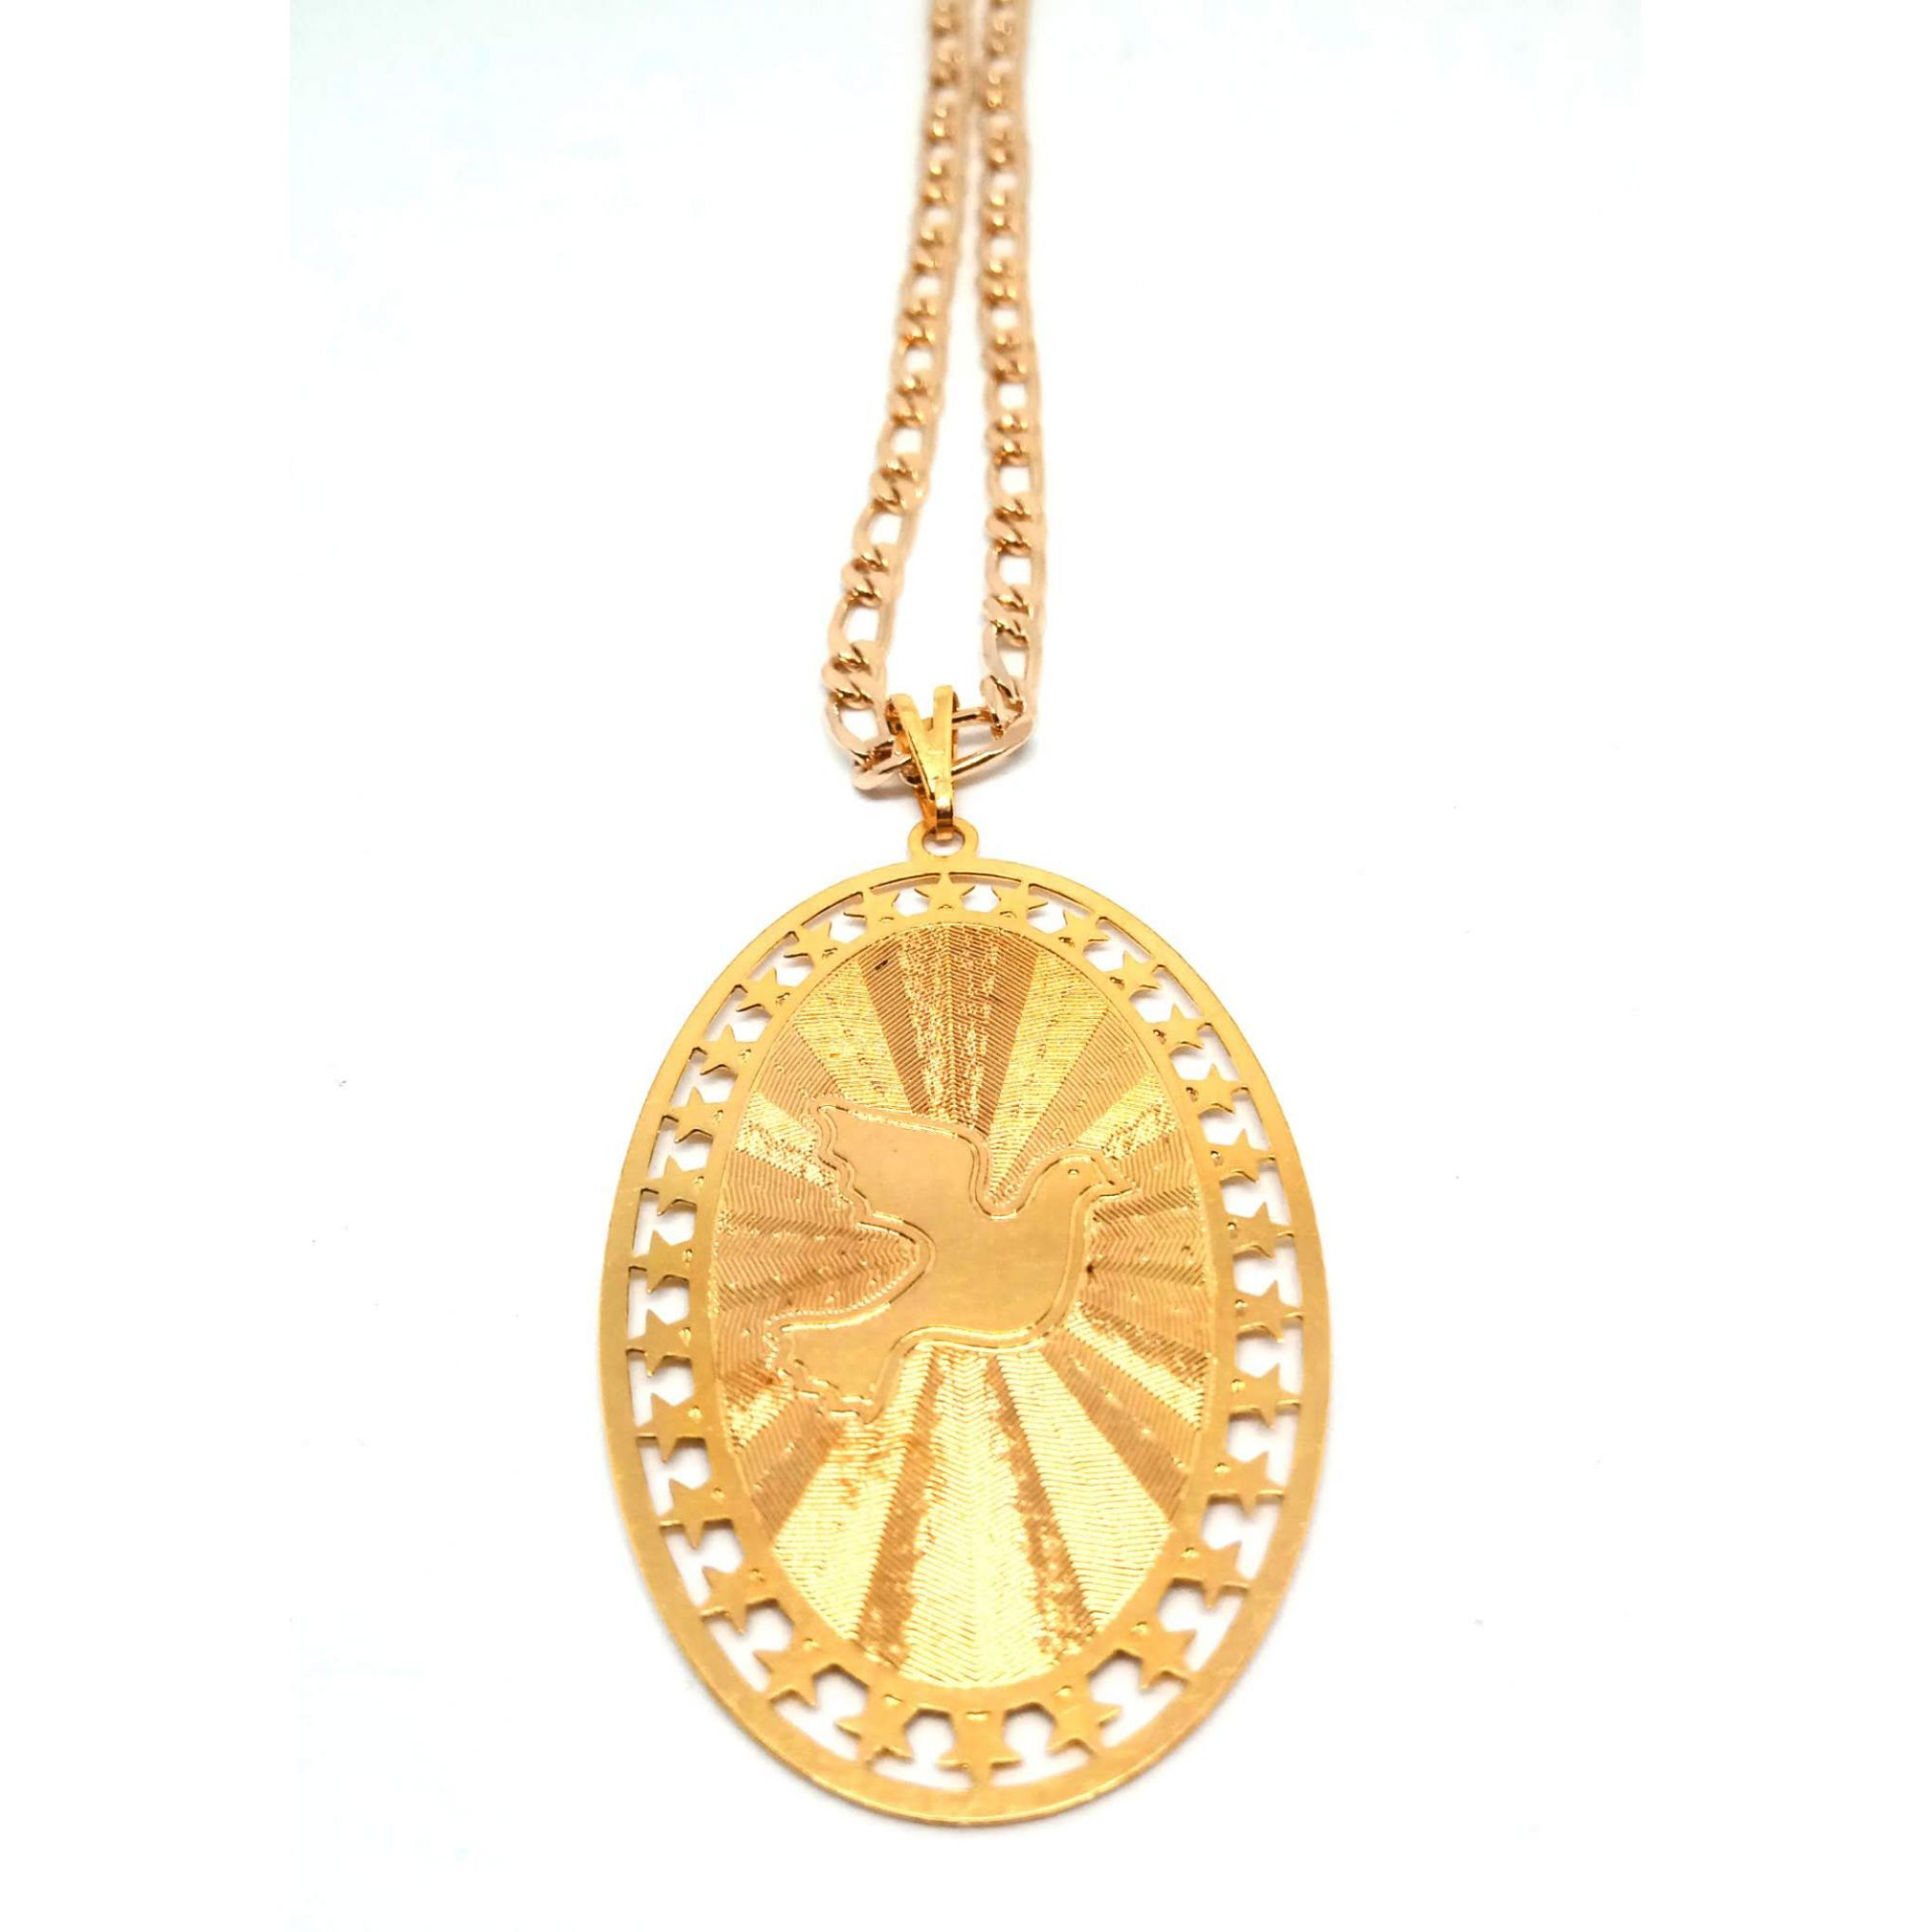 Colar Corrente Feminina Medalha Espirito Santo Banhada Ouro